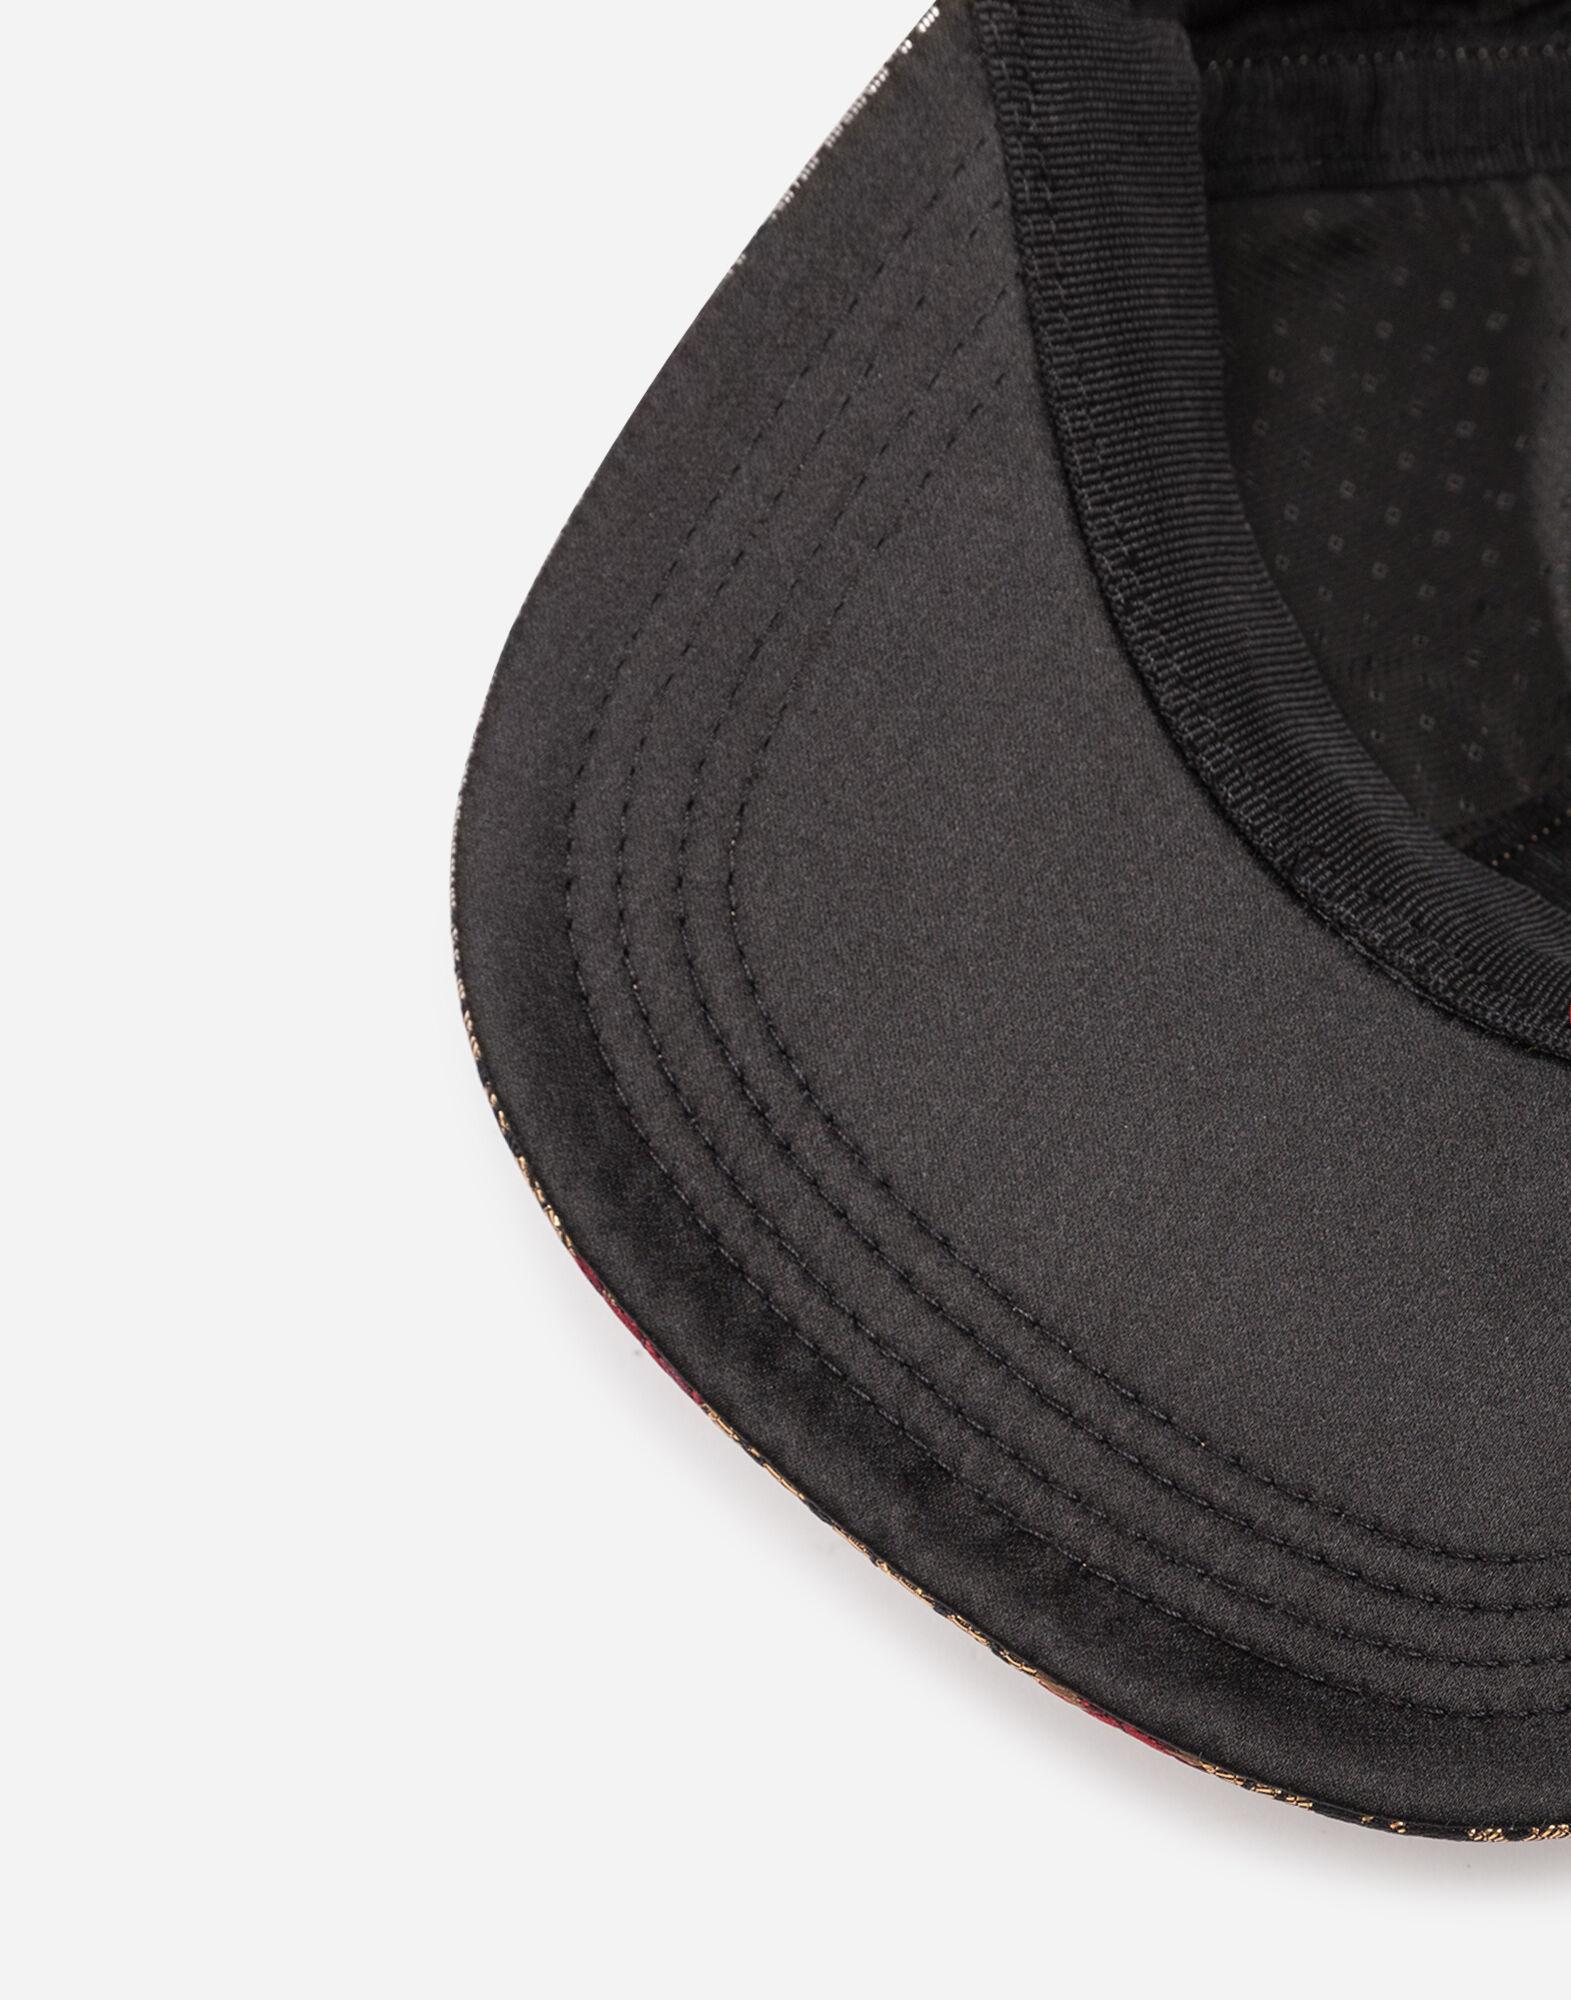 BASEBALL CAP IN JACQUARD